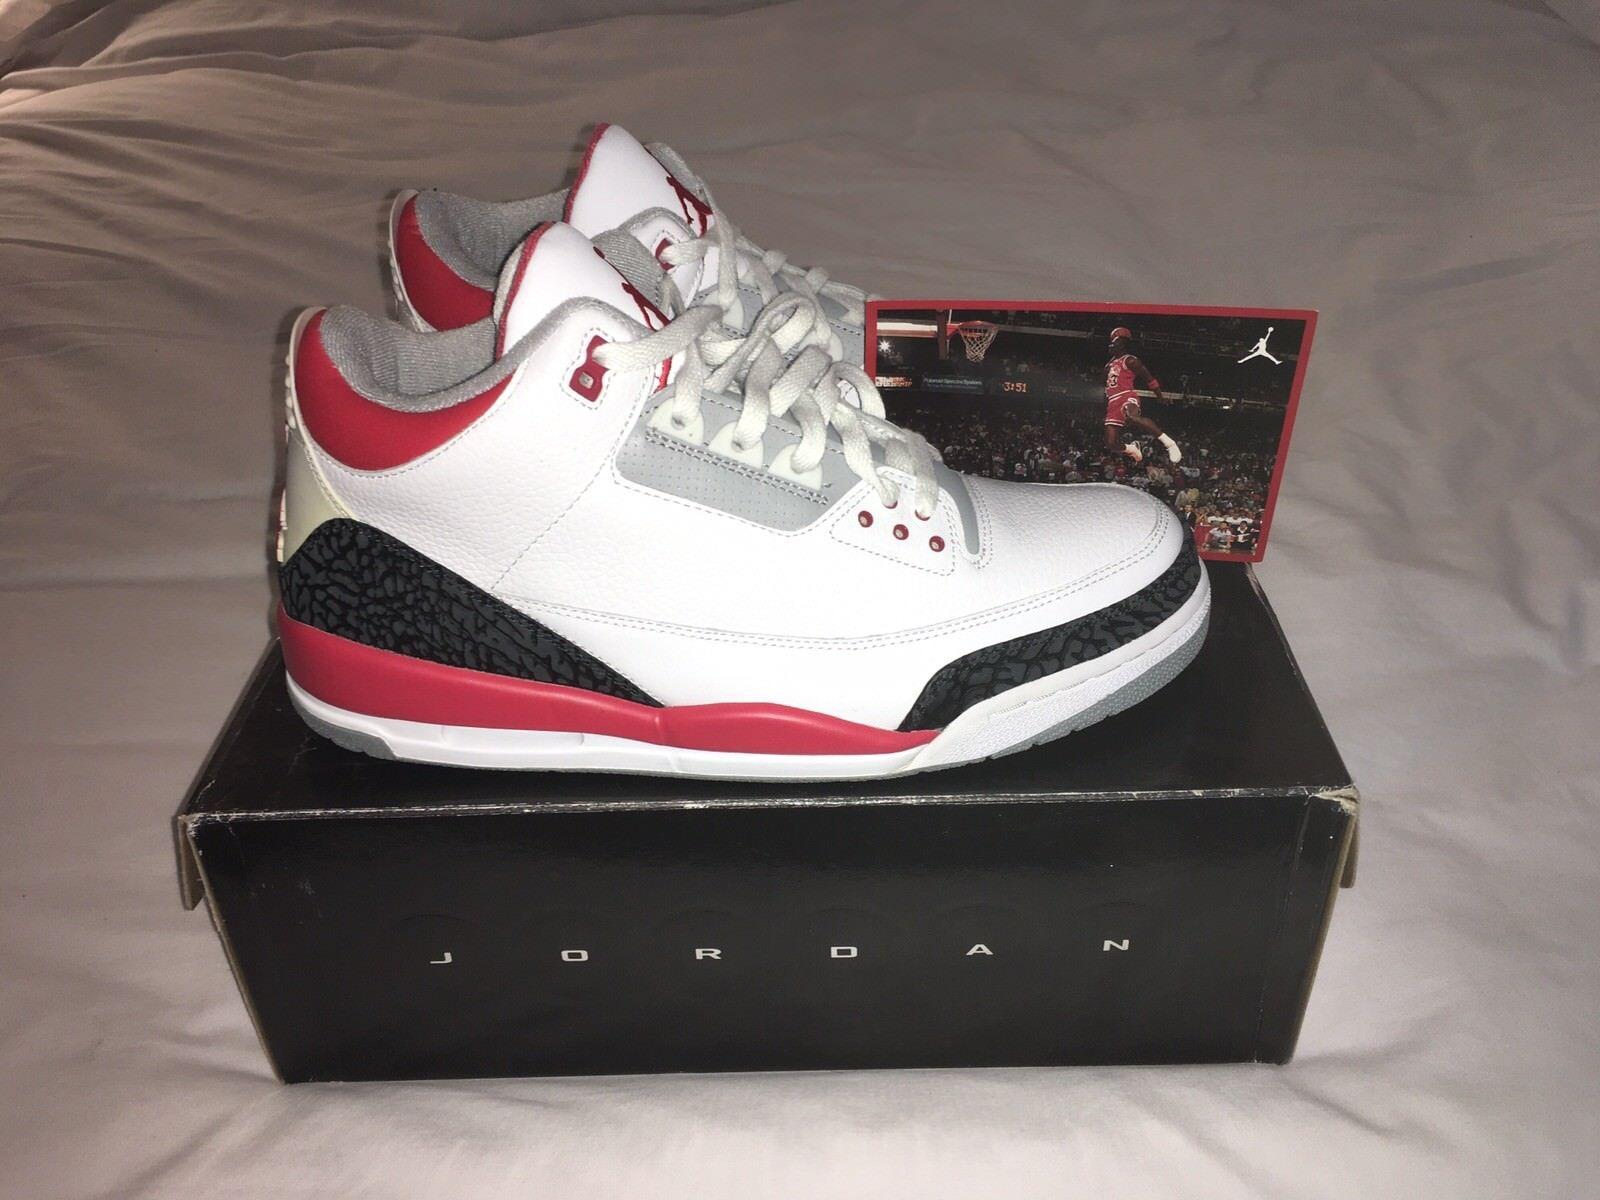 2007 Air Jordan 3 Retro White FireRed CementGrey Size 13 BNIB